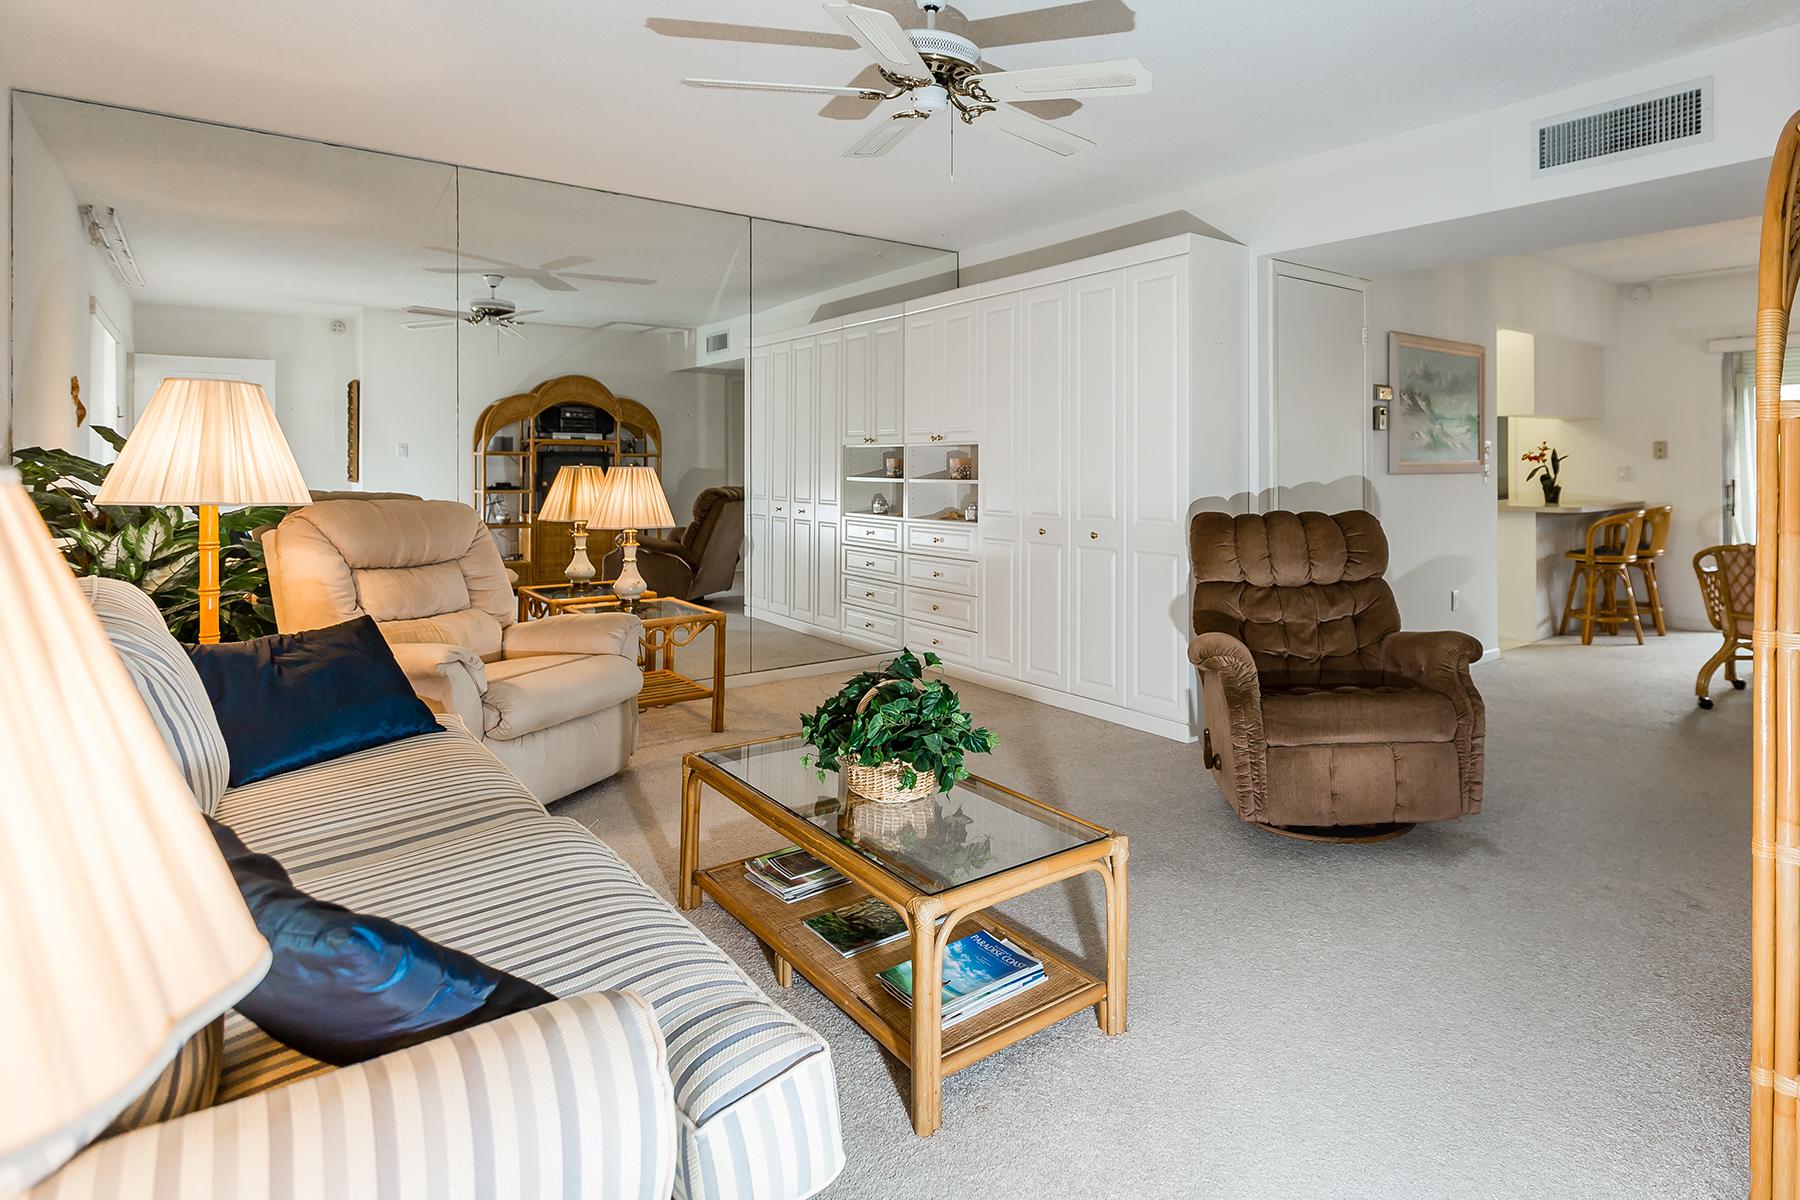 Nhà chung cư vì Bán tại PARK SHORE - HIDDEN LAKE VILLAS 788 Park Shore Dr H36 Naples, Florida, 34103 Hoa Kỳ